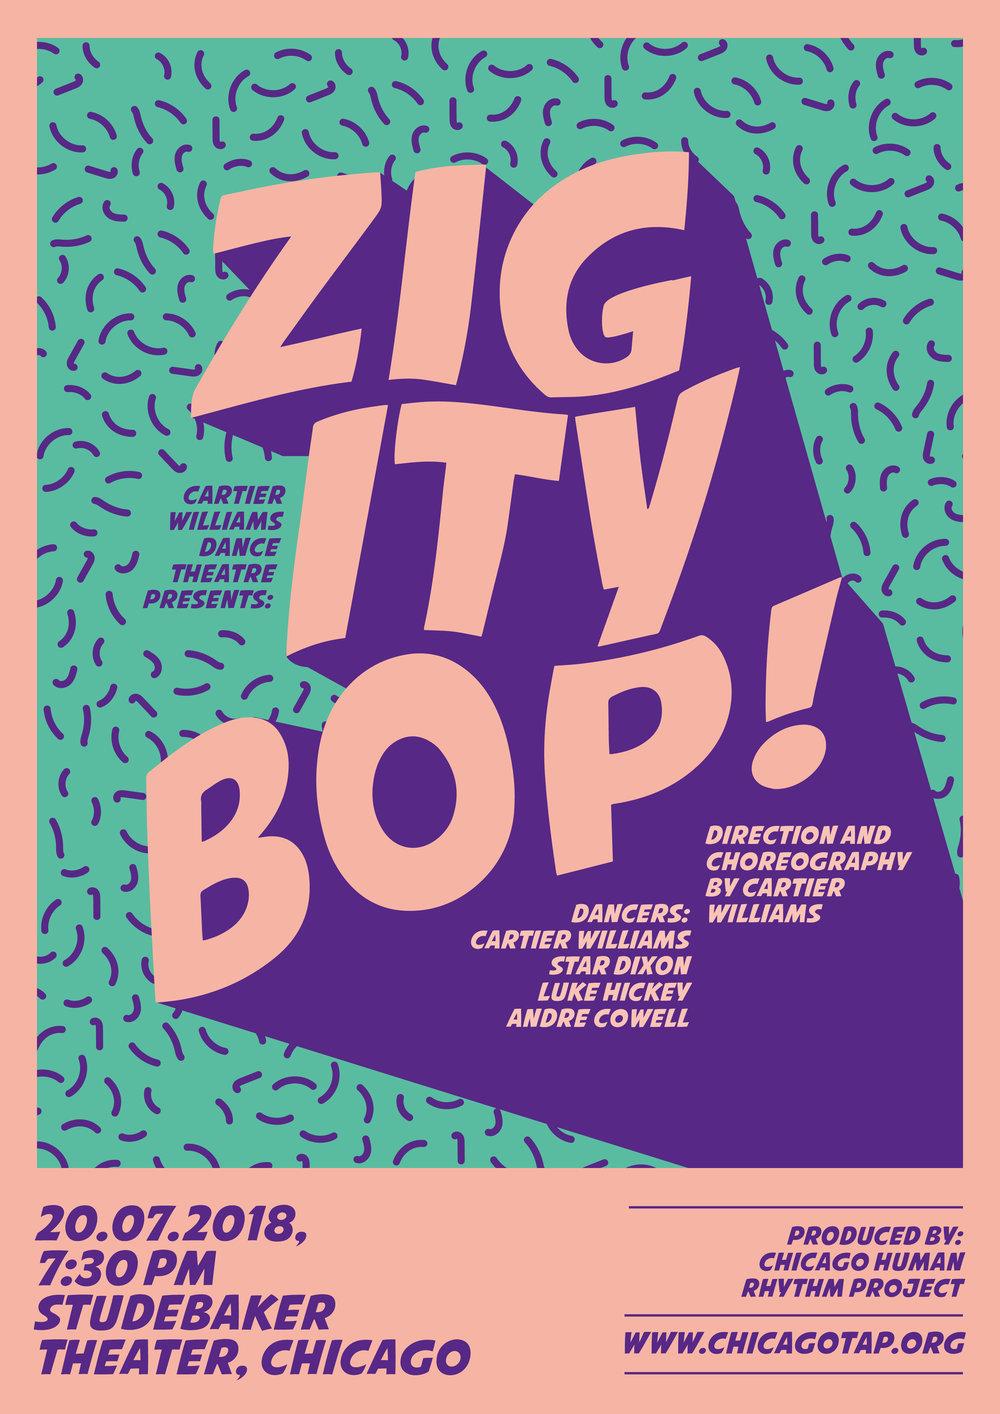 ziggitybop_chicago8.jpg